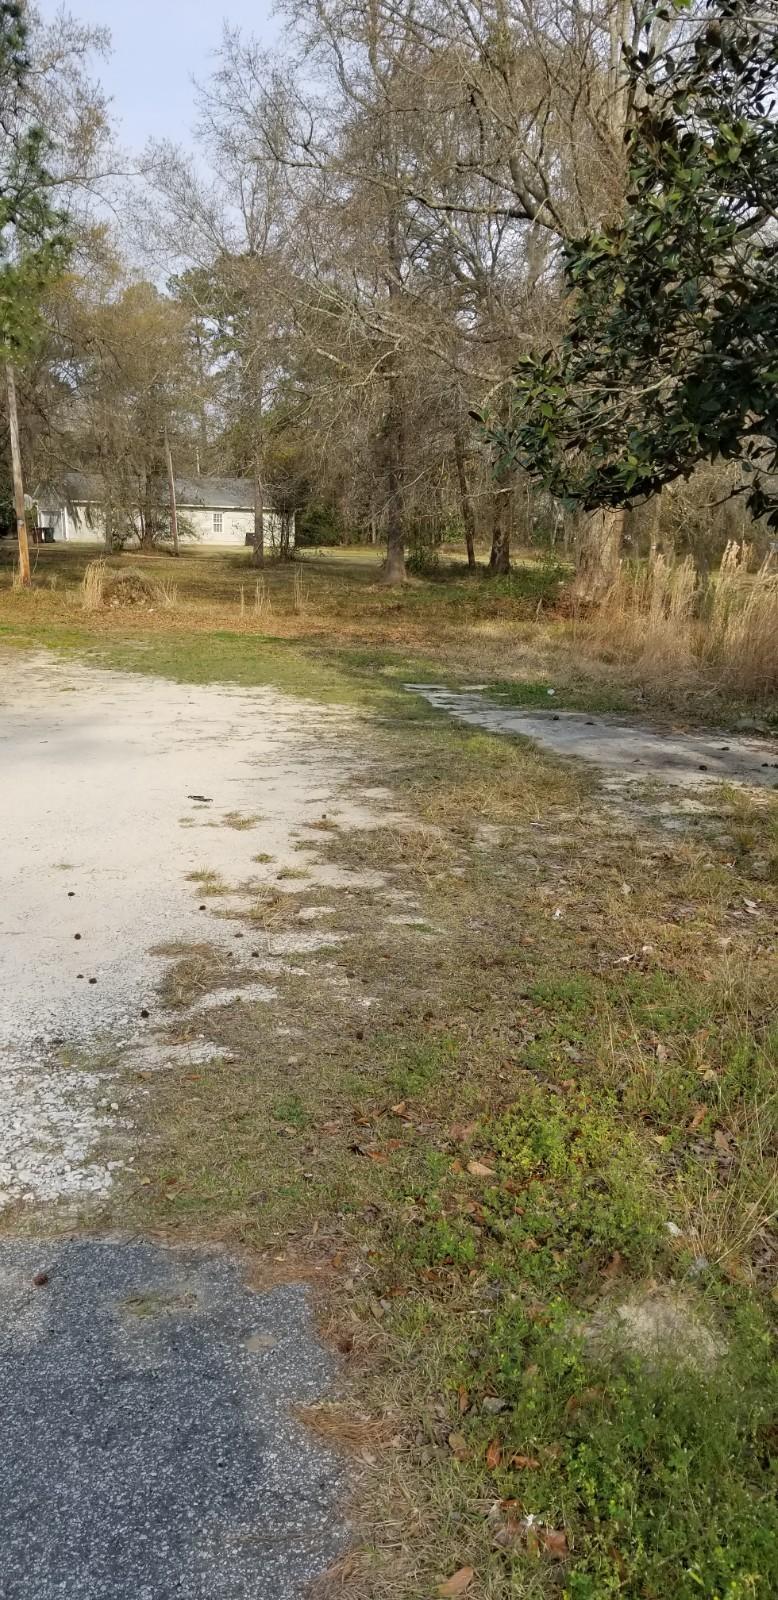 223 S Live Oak Drive Moncks Corner, SC 29461